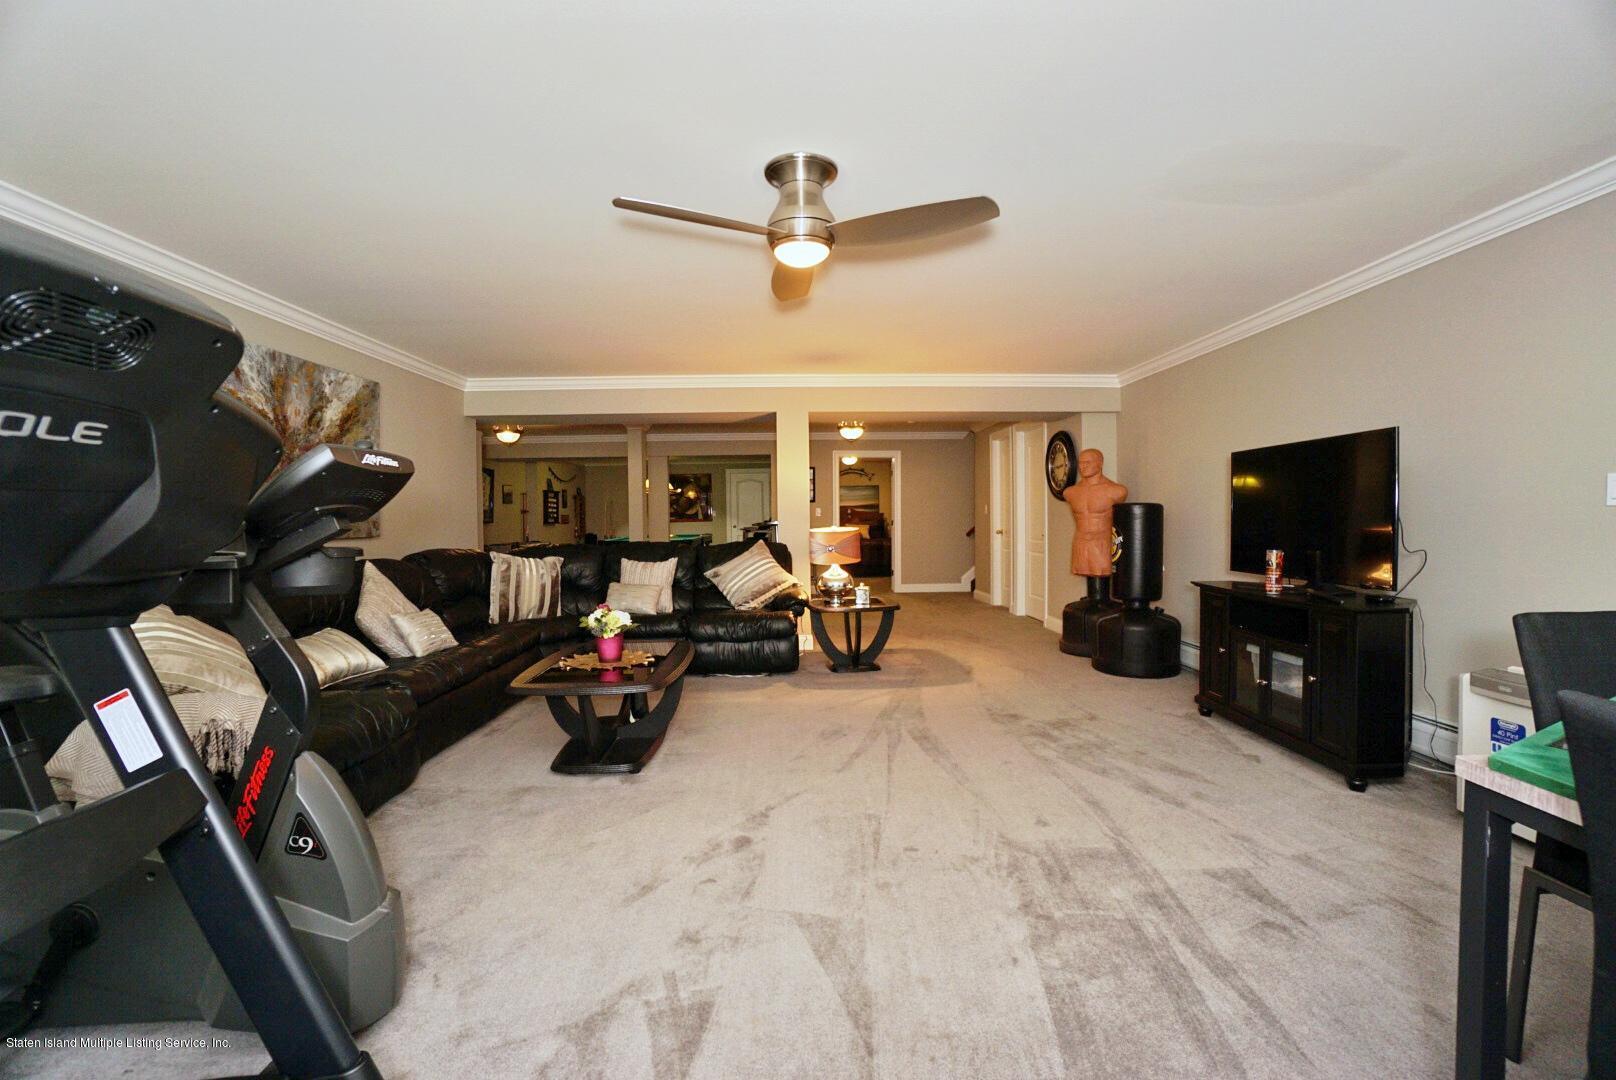 Single Family - Attached 80 Pilot Lane  Staten Island, NY 10309, MLS-1140636-63